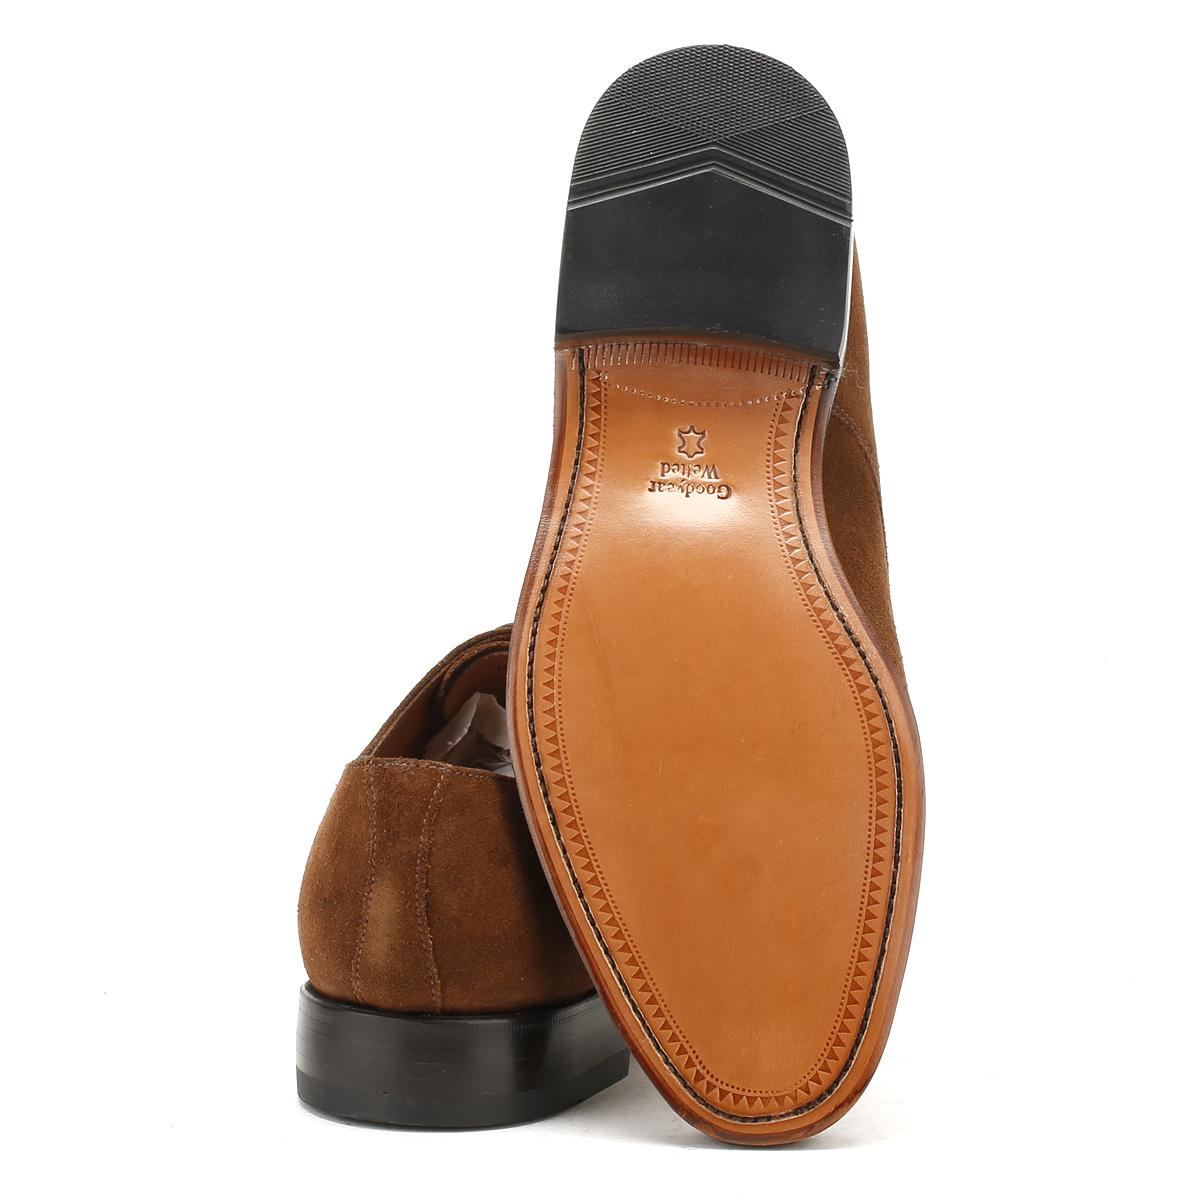 Mens Tan Suede Derby Shoes